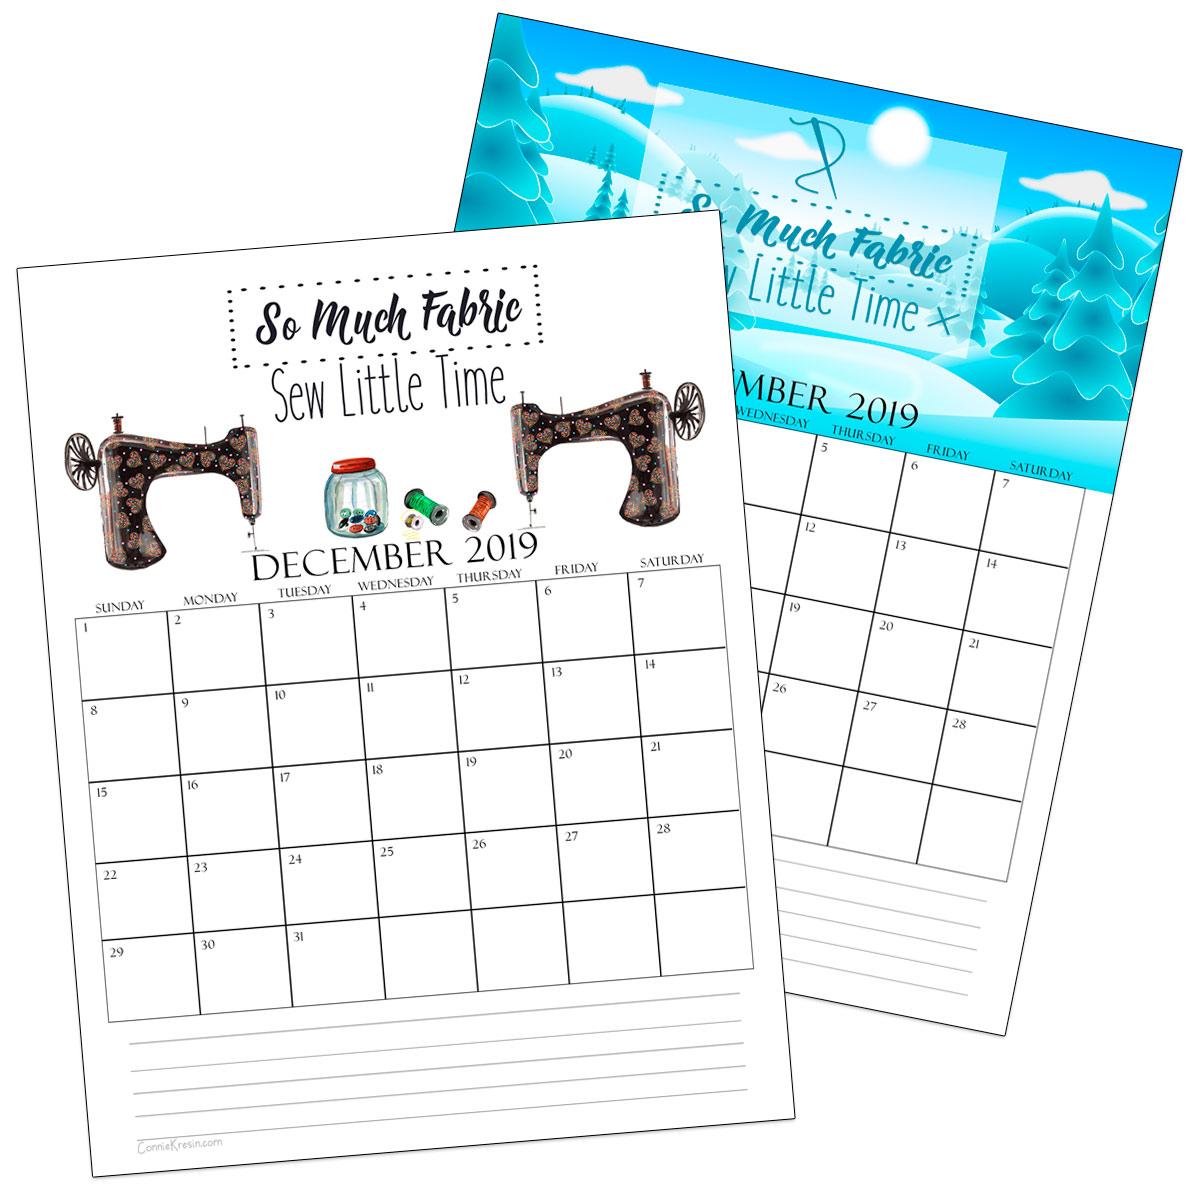 December 2019 Sewing Calendars